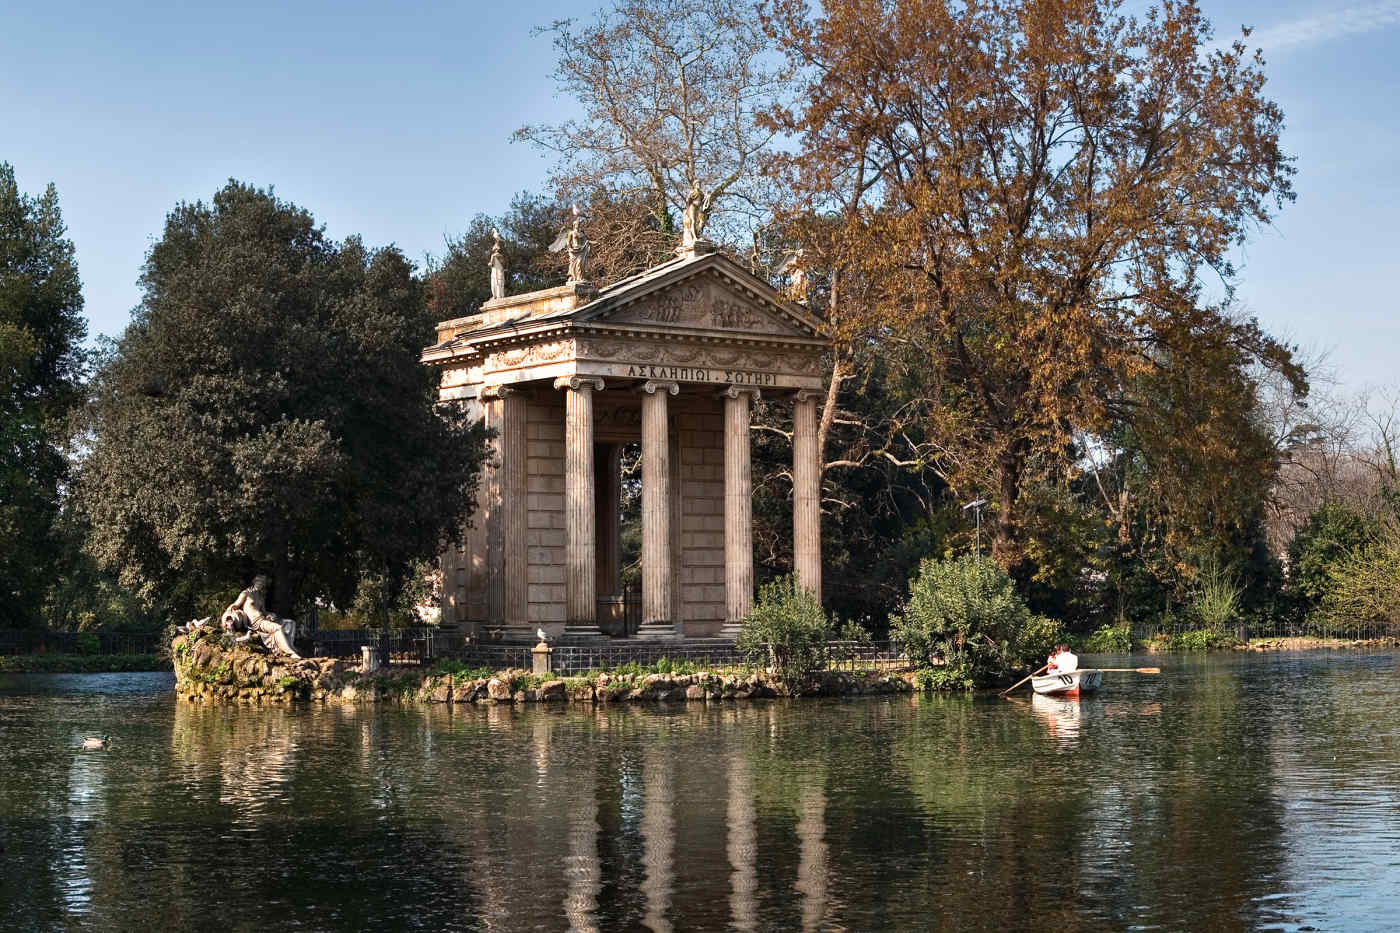 Borghese Gardens in Rome